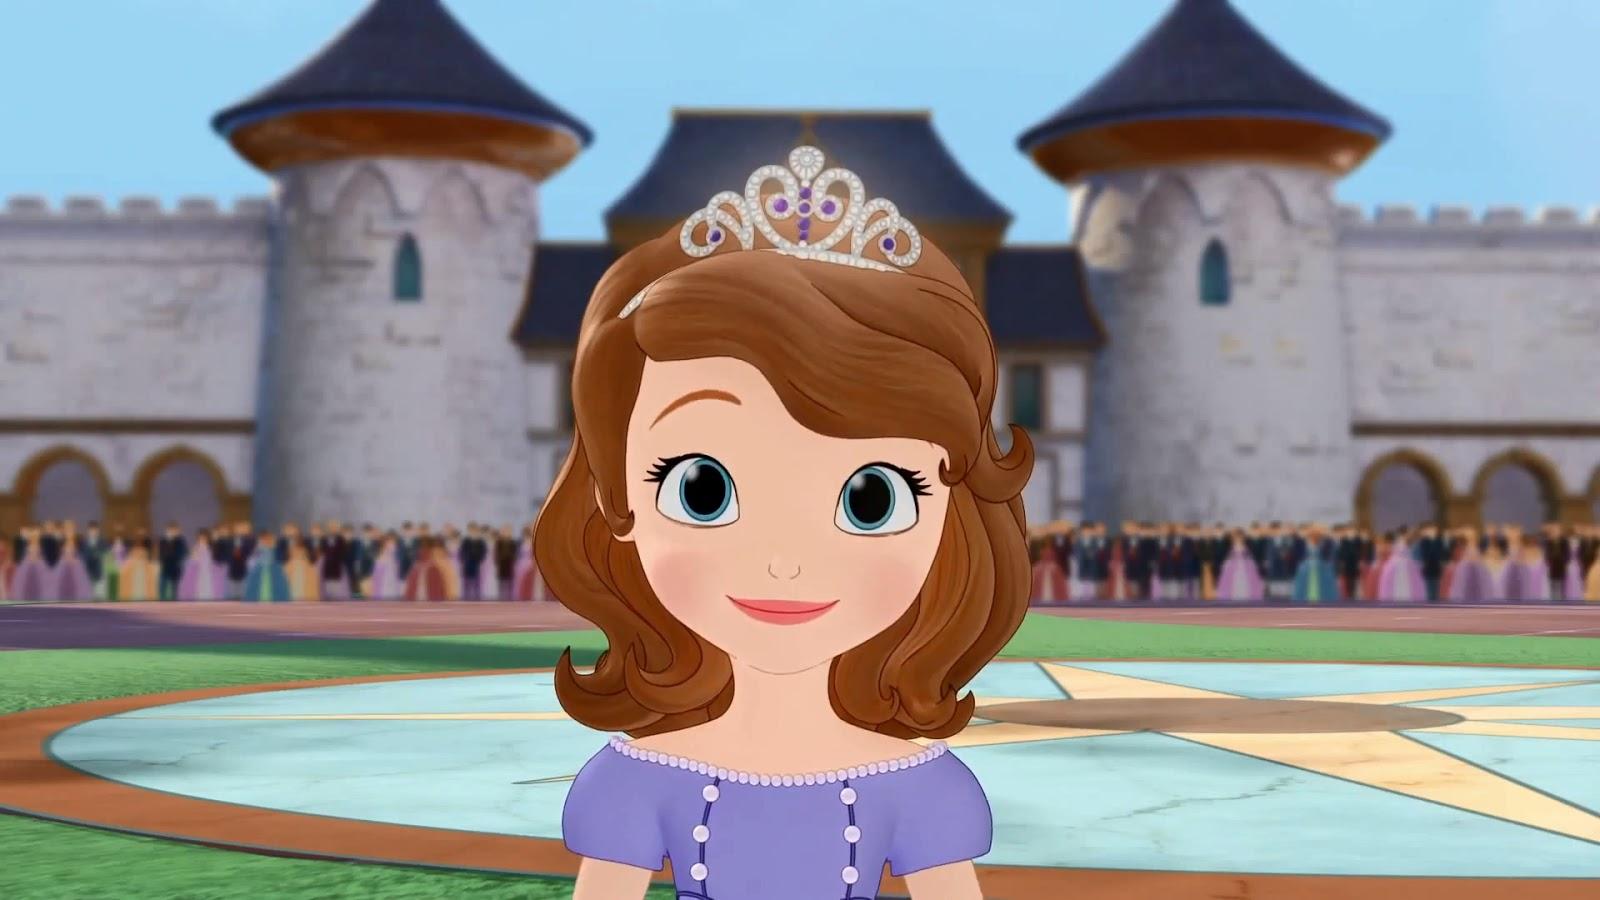 PoPcorn的卡通翻譯: [KCAHV] 小公主蘇菲亞:公主傳奇 Sofia the First Once Upon a Princess 英文發音中文字幕 翻譯線上看